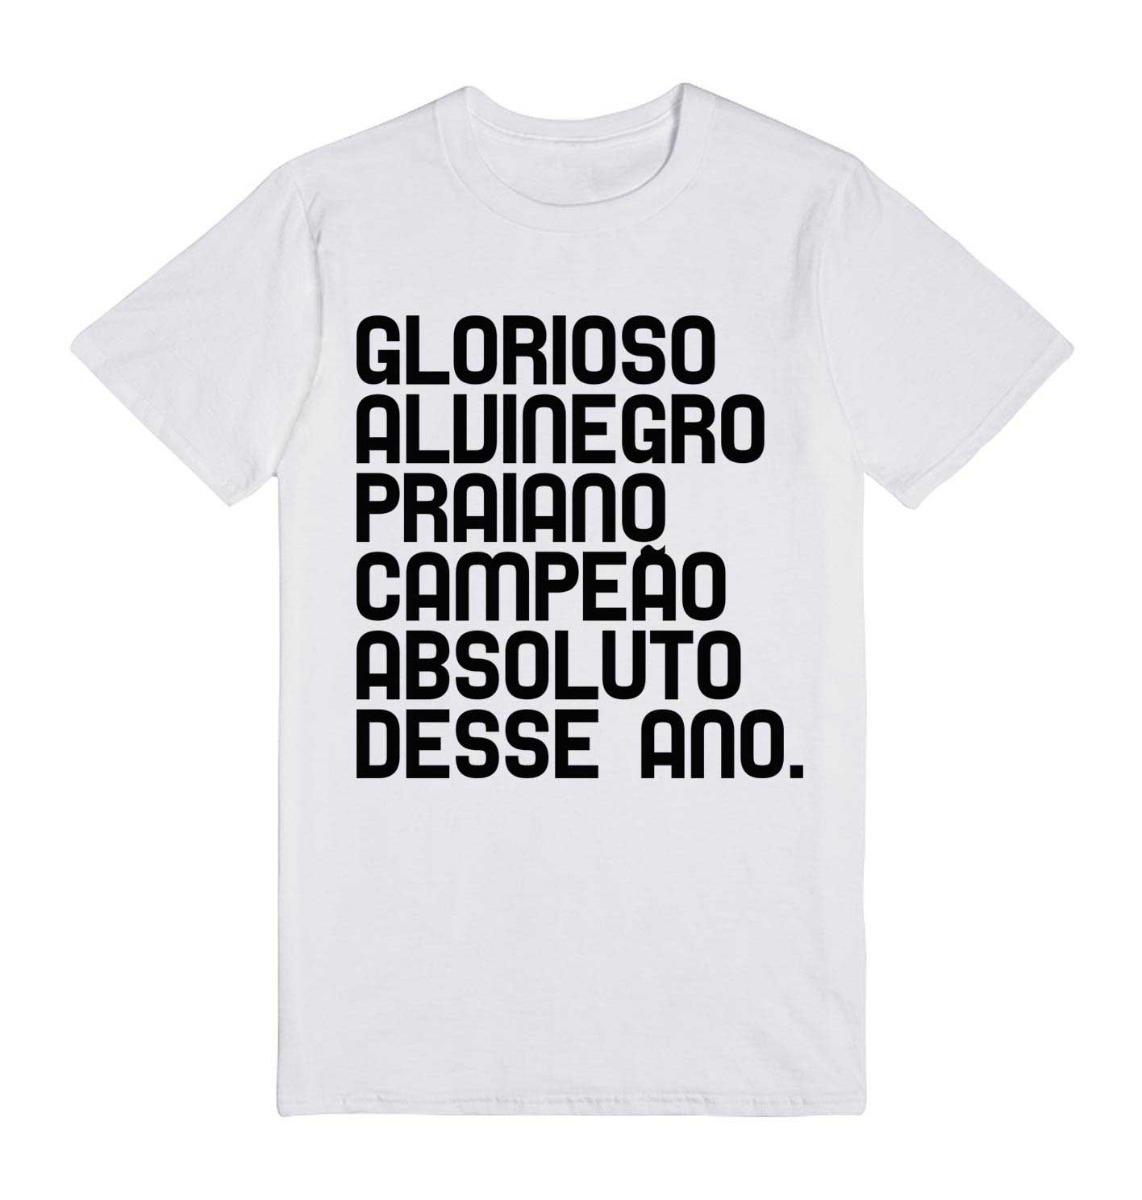 9a2bd4ad8b Camisa Do Santos Glorioso Alvinegro - Camiseta Do Santos - R  29